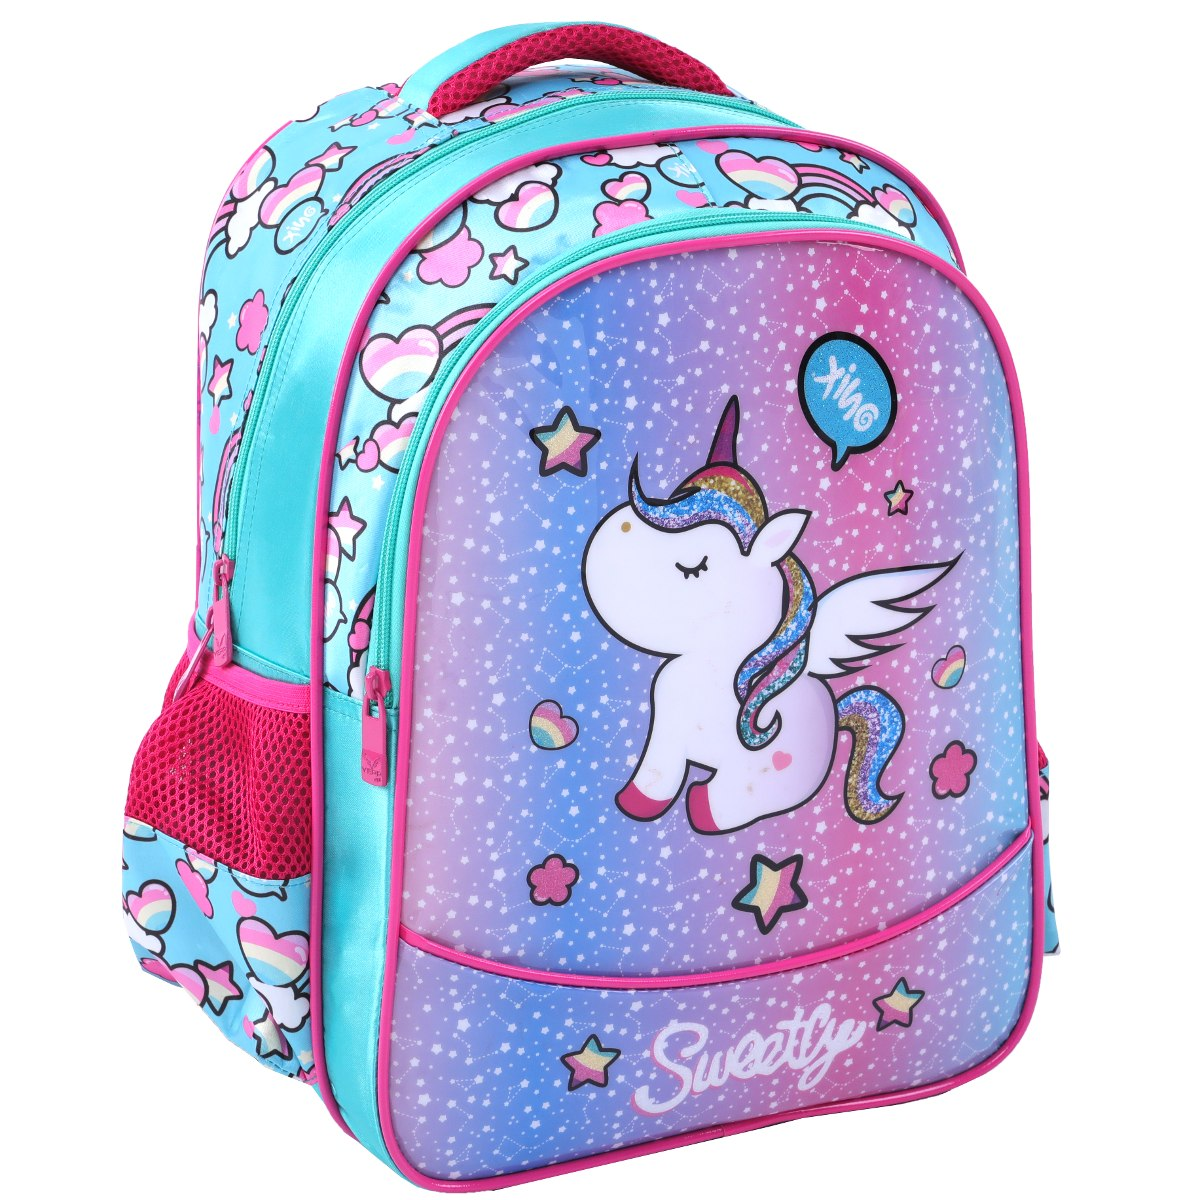 2d6b7f2b0 mochila escolar 2019 infantil de costas unicornio barata boa. Carregando  zoom.